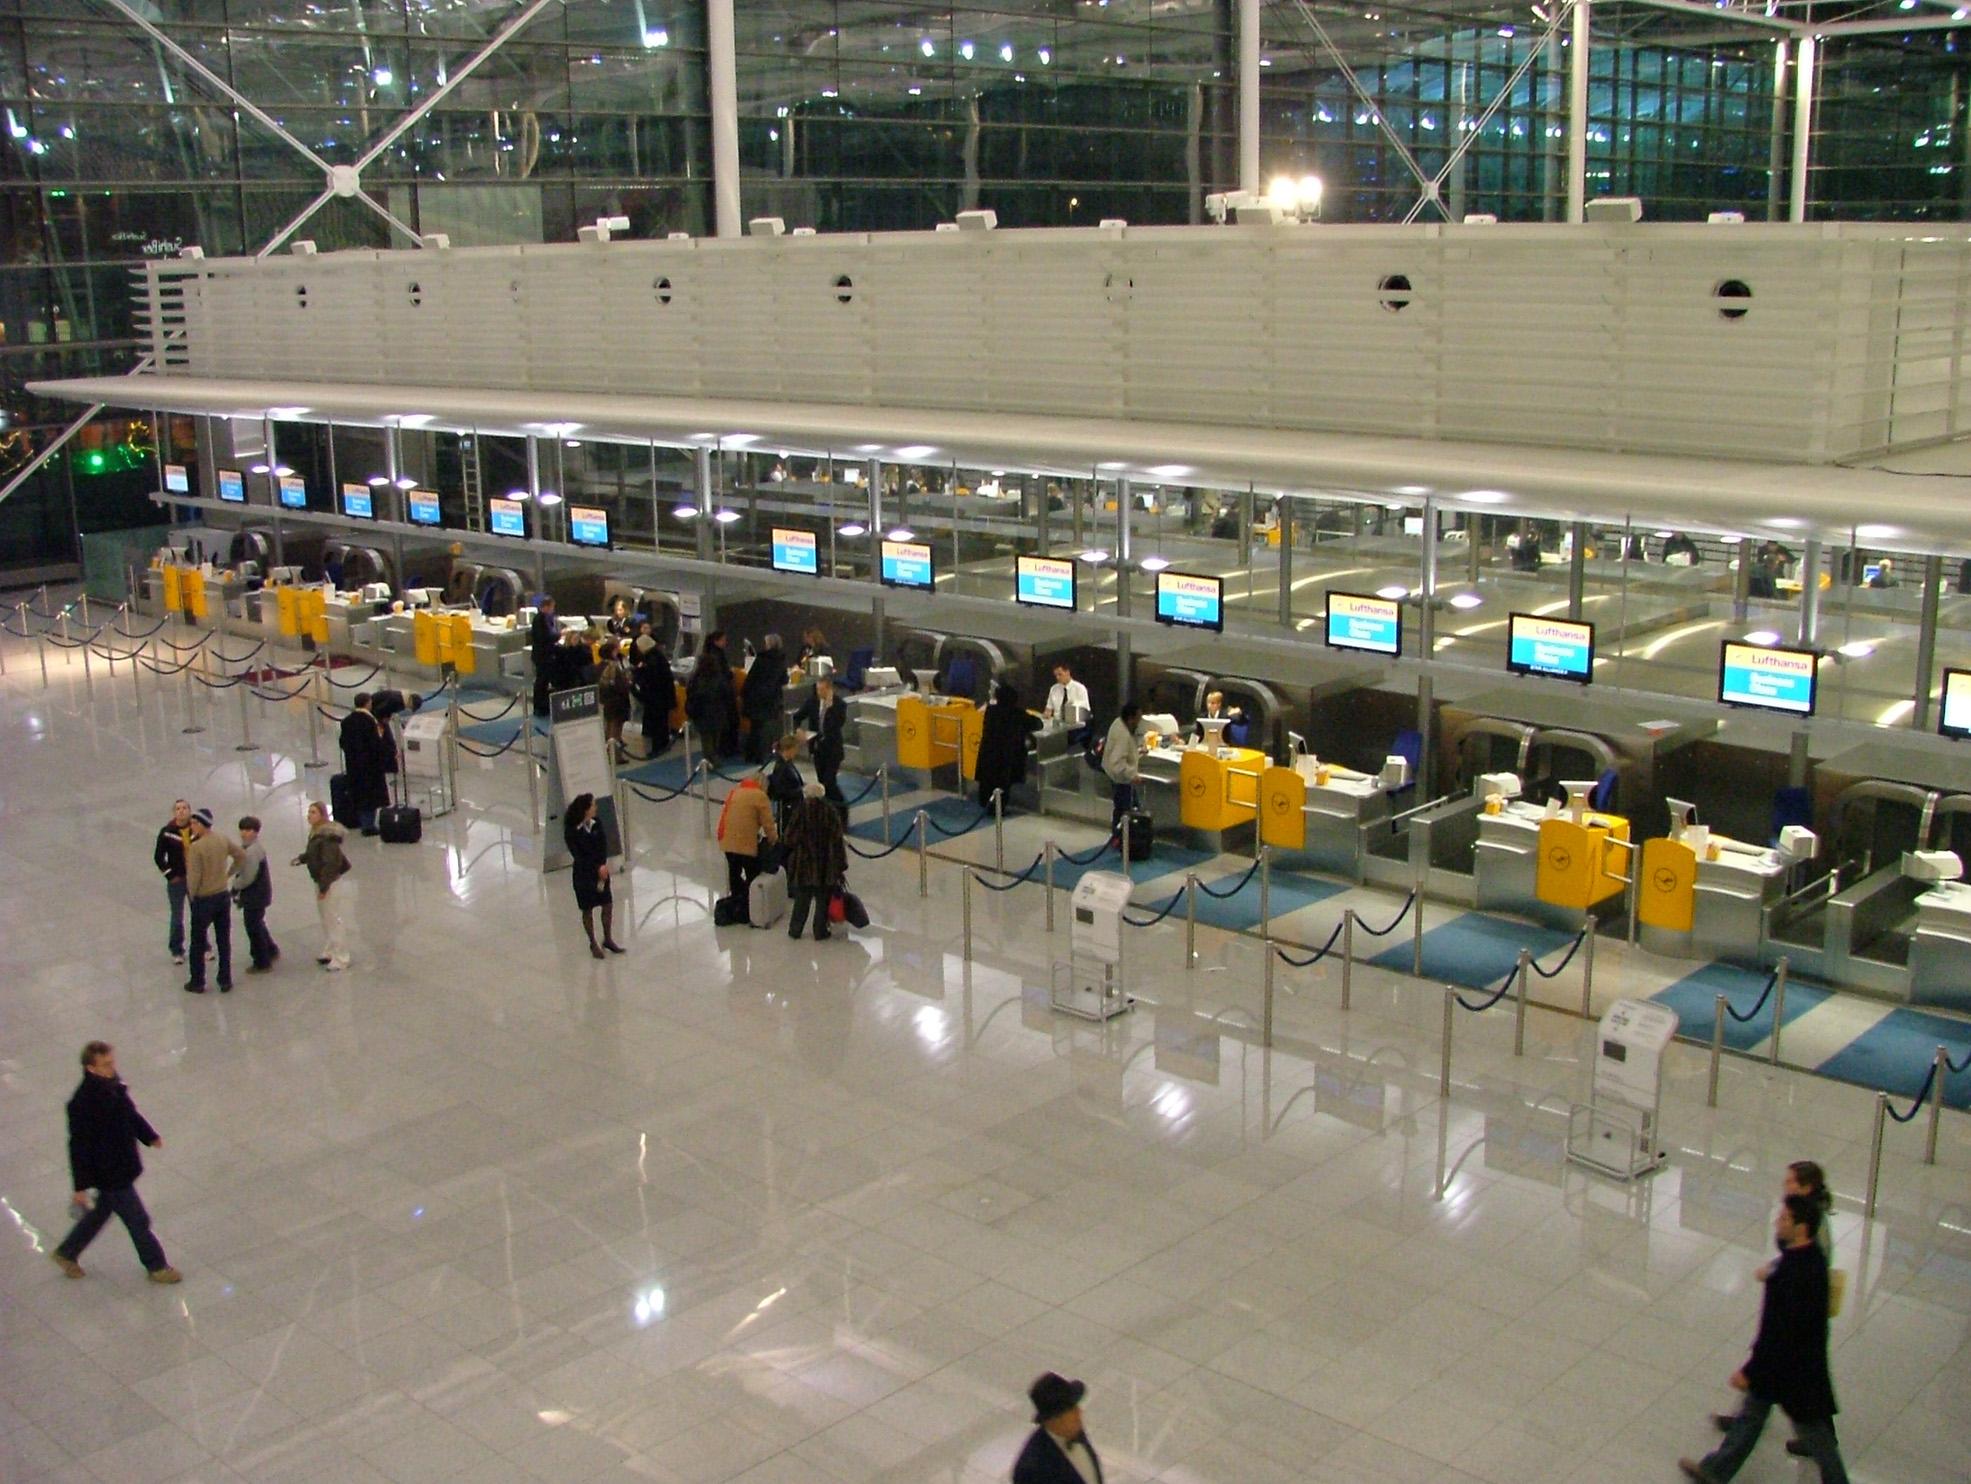 Секс в аеропорте фото 27 фотография